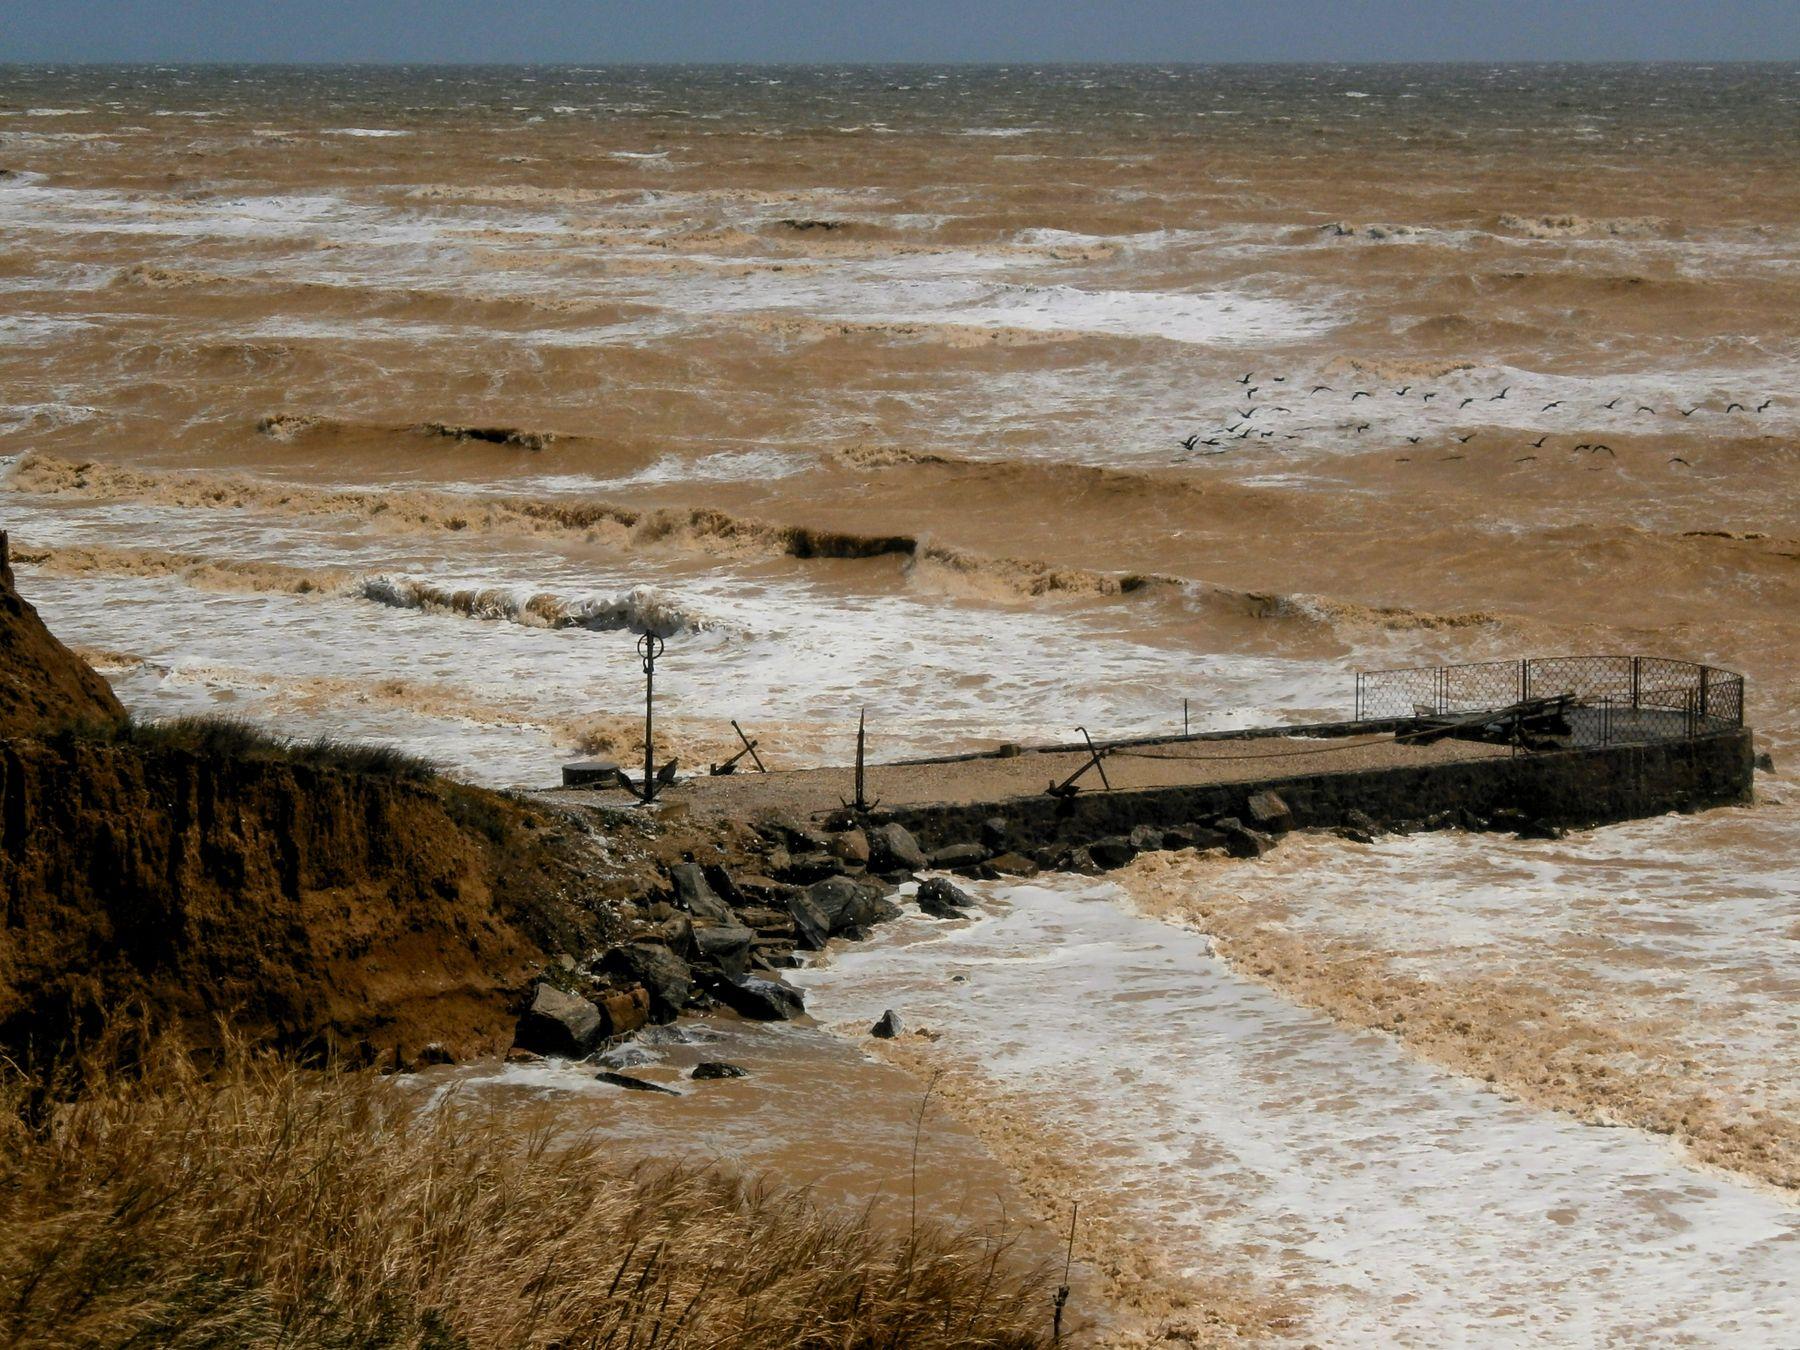 Азовское море, Мироновка. Азовское море Мироновка